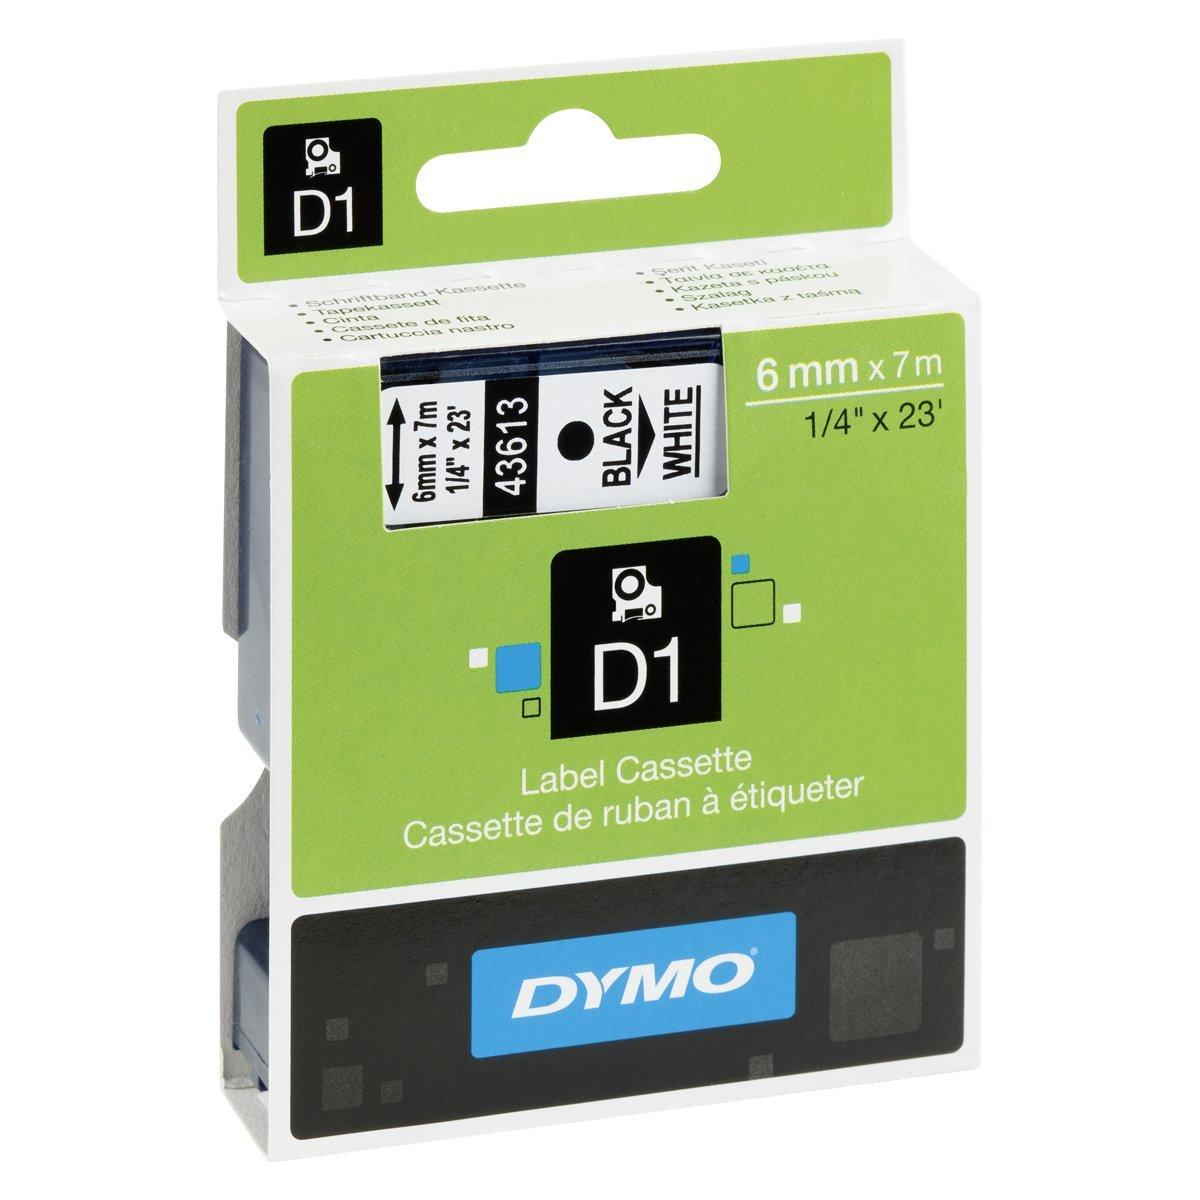 DYMO TAPE D1 6X7M   BLACK/WHITE S0720780 papīrs